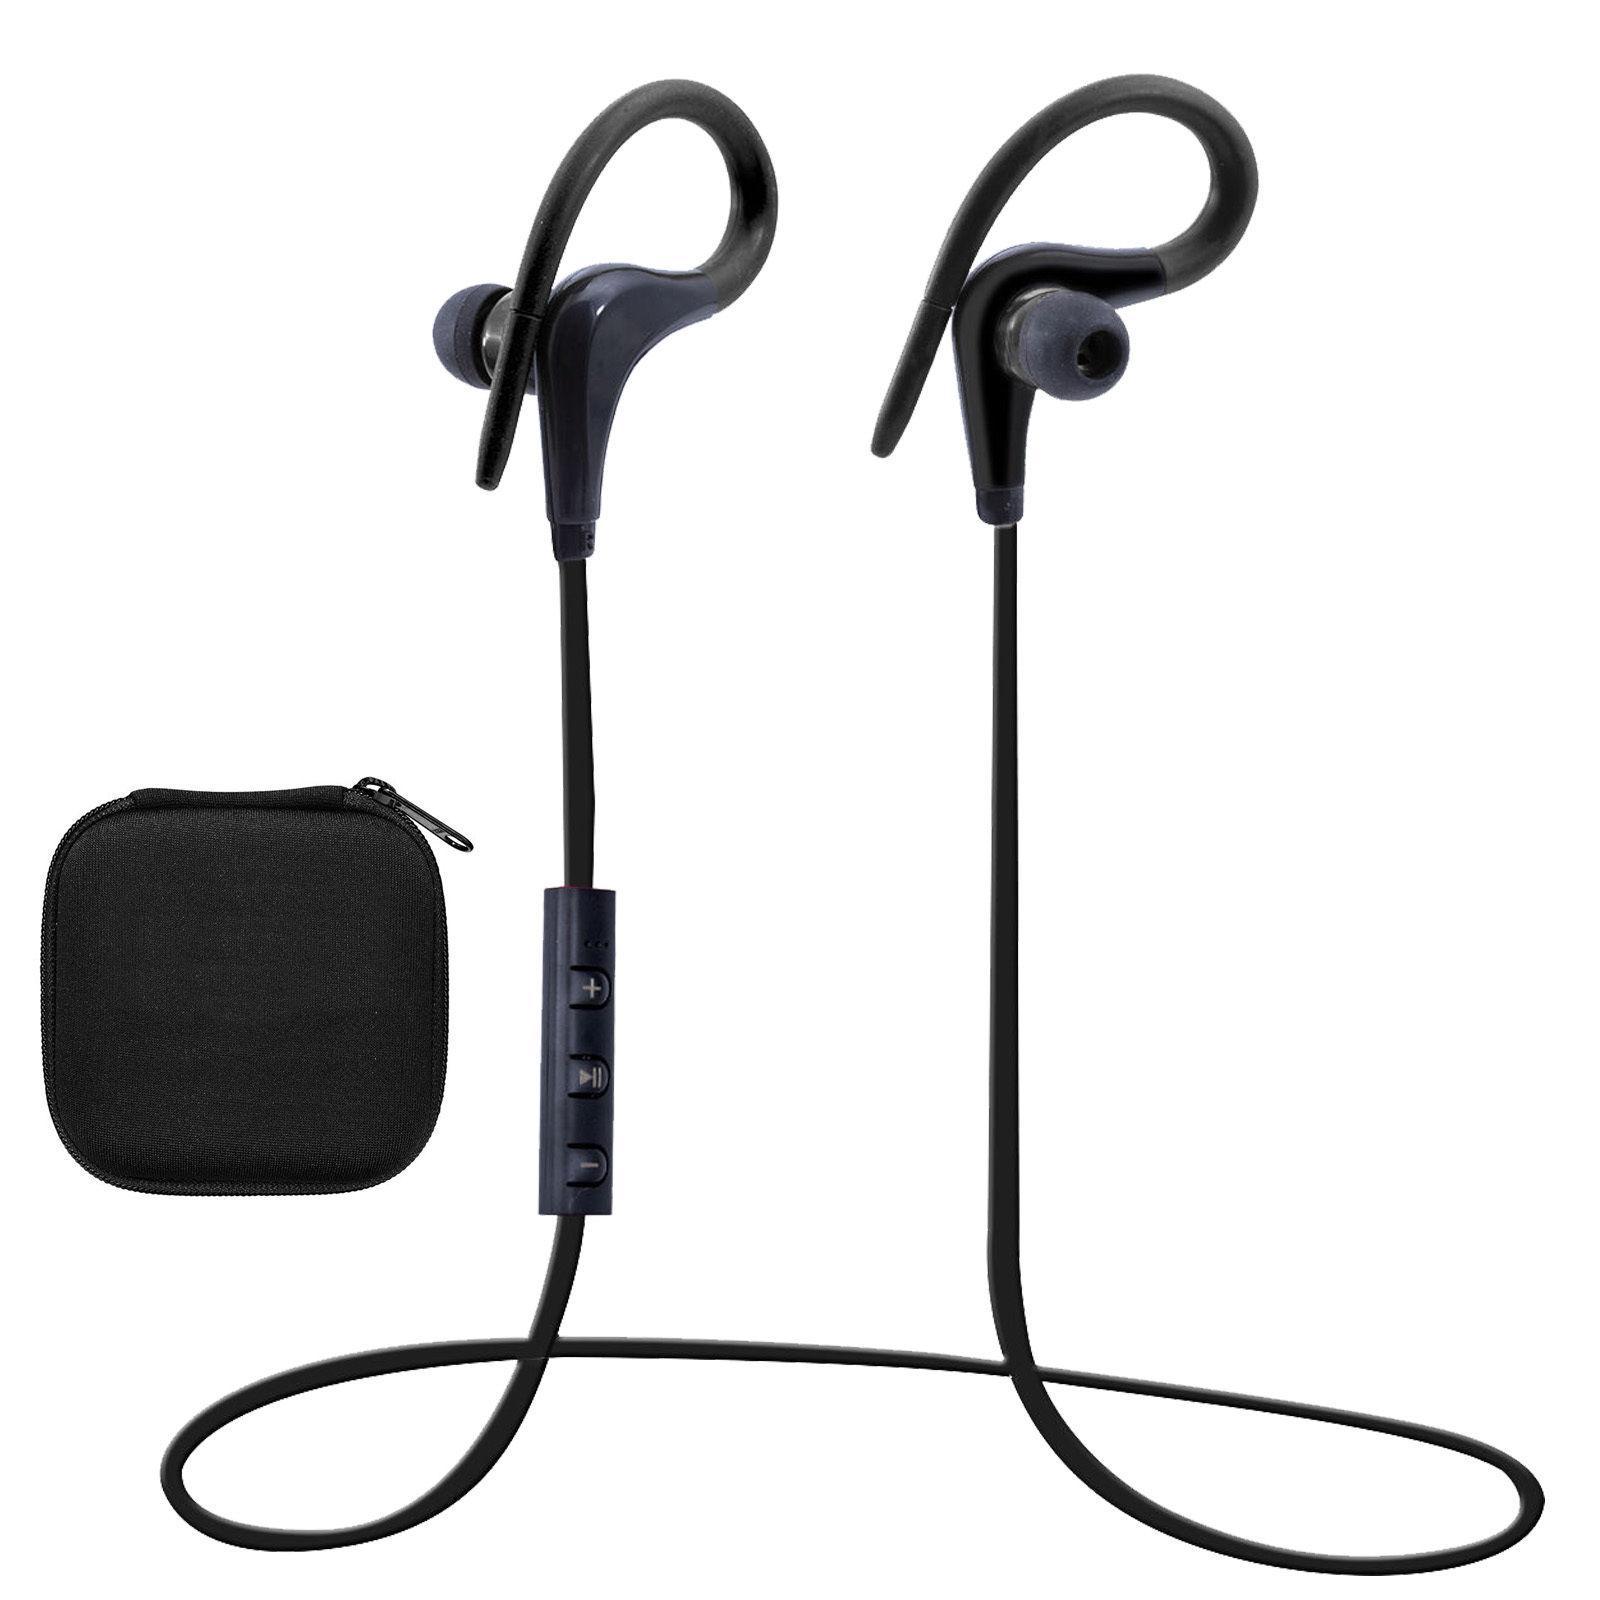 Auricolari Pioneer Auricolare Bluetooth Senza Fili Auricolare Stereo ... 94188c8109d6